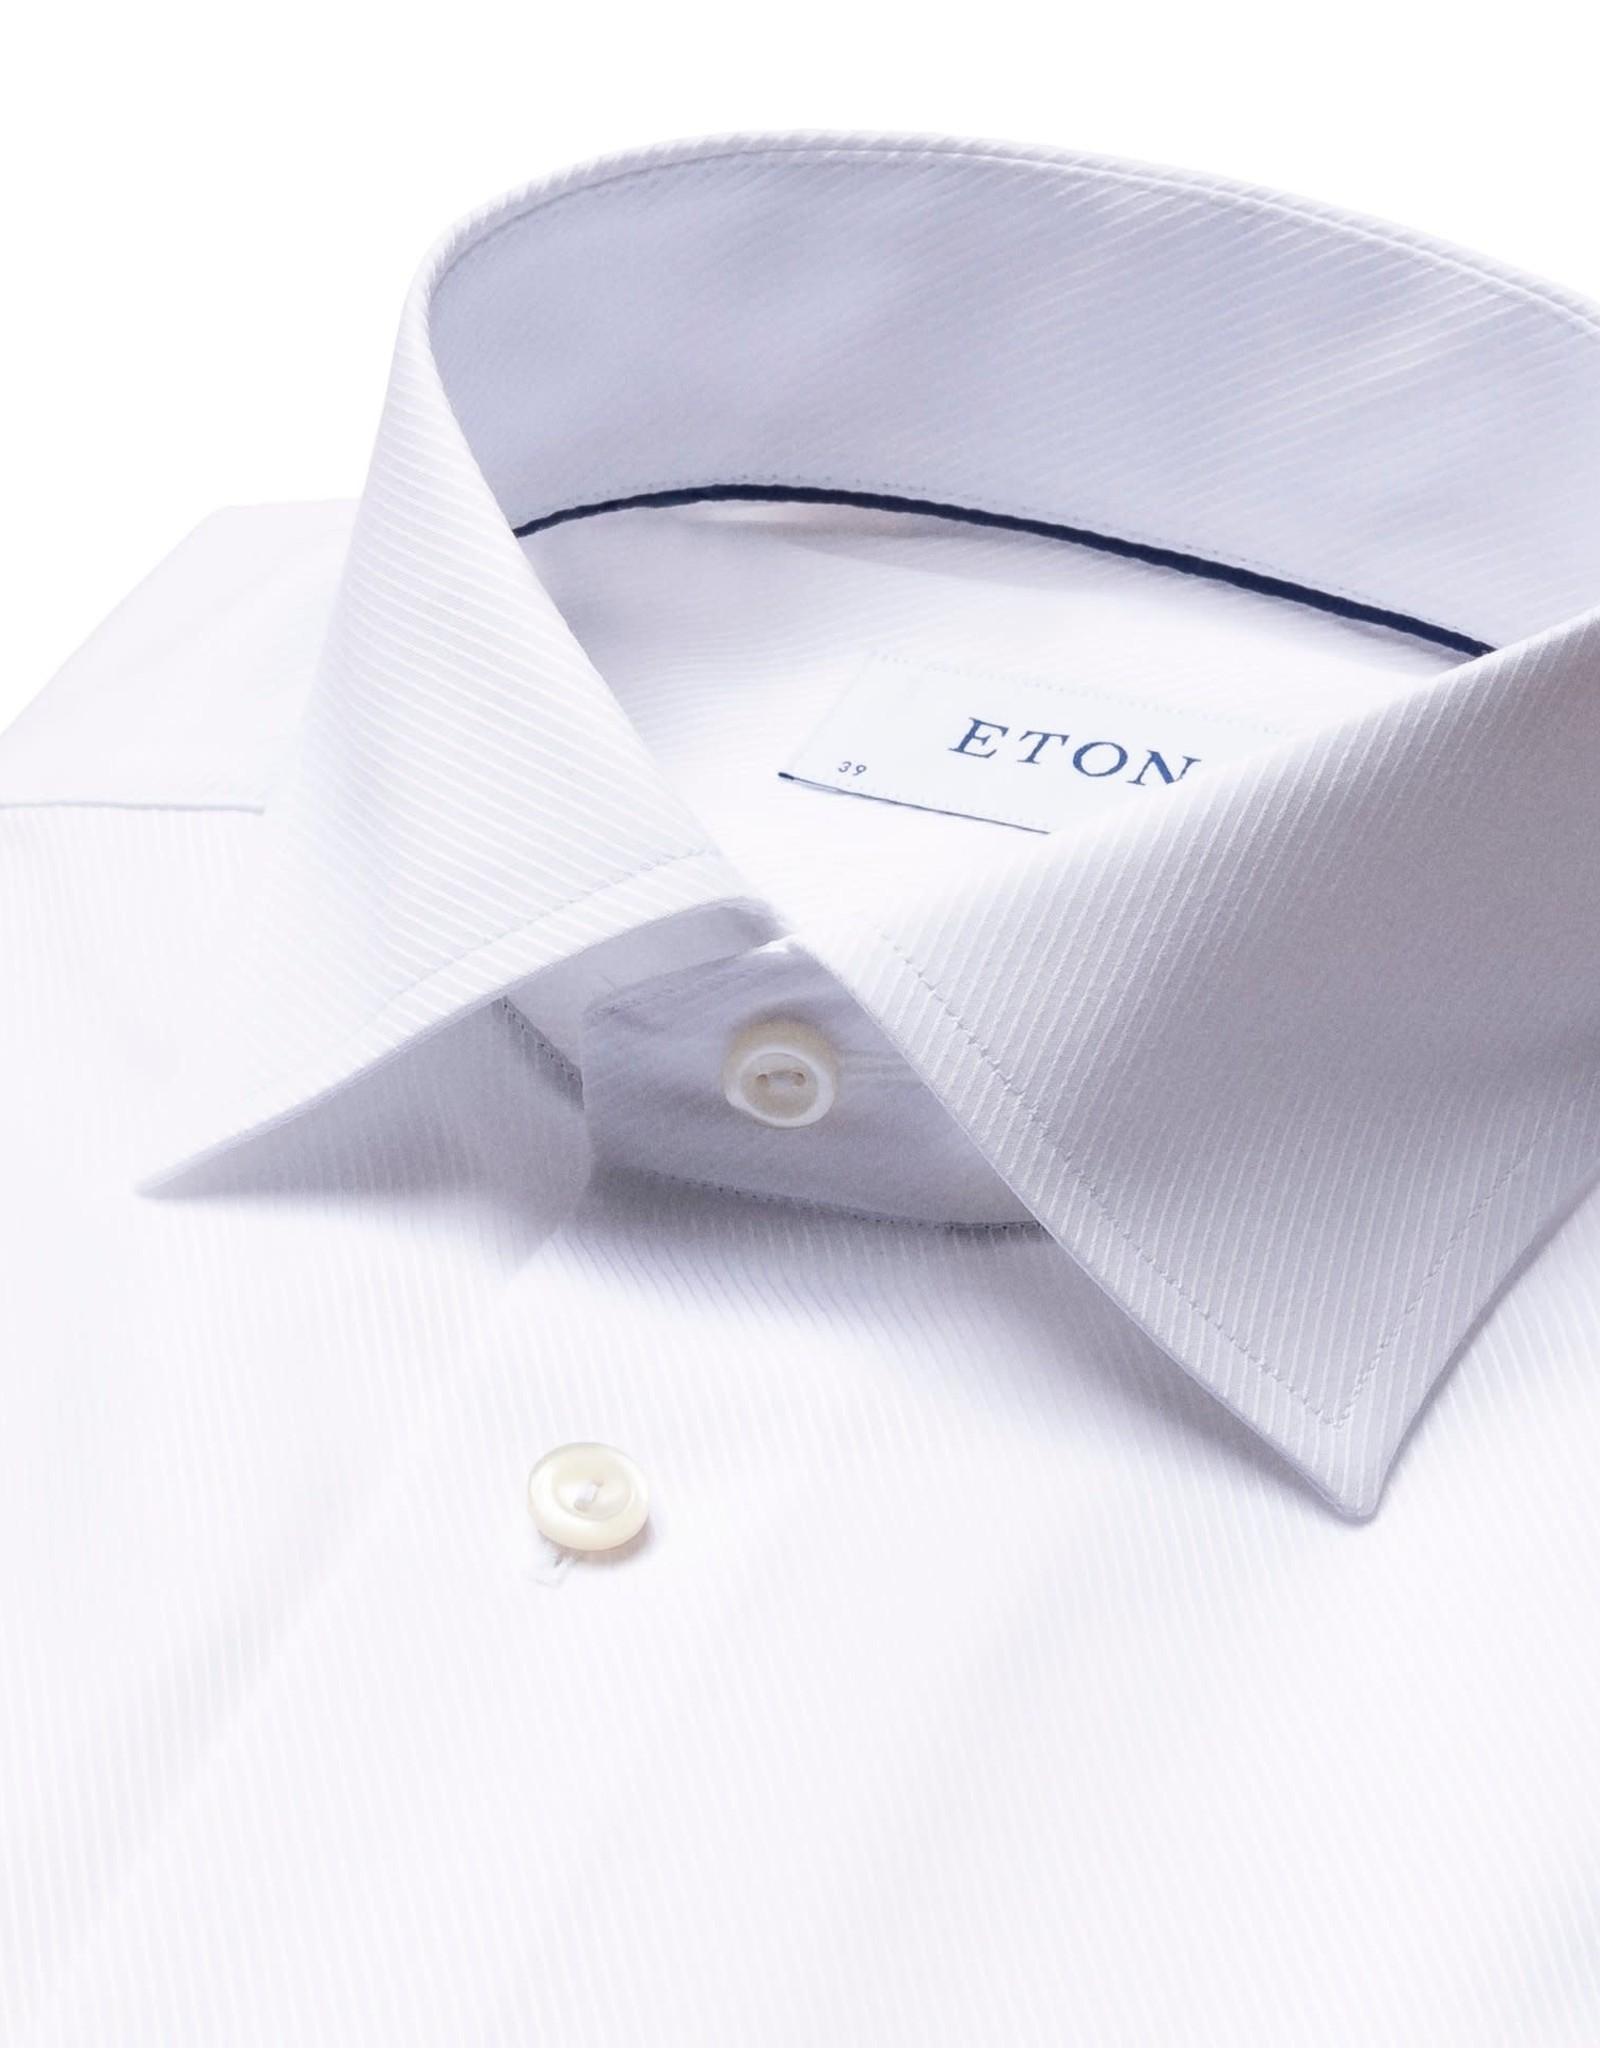 Eton Eton hemd wit Slim fit 1773/01